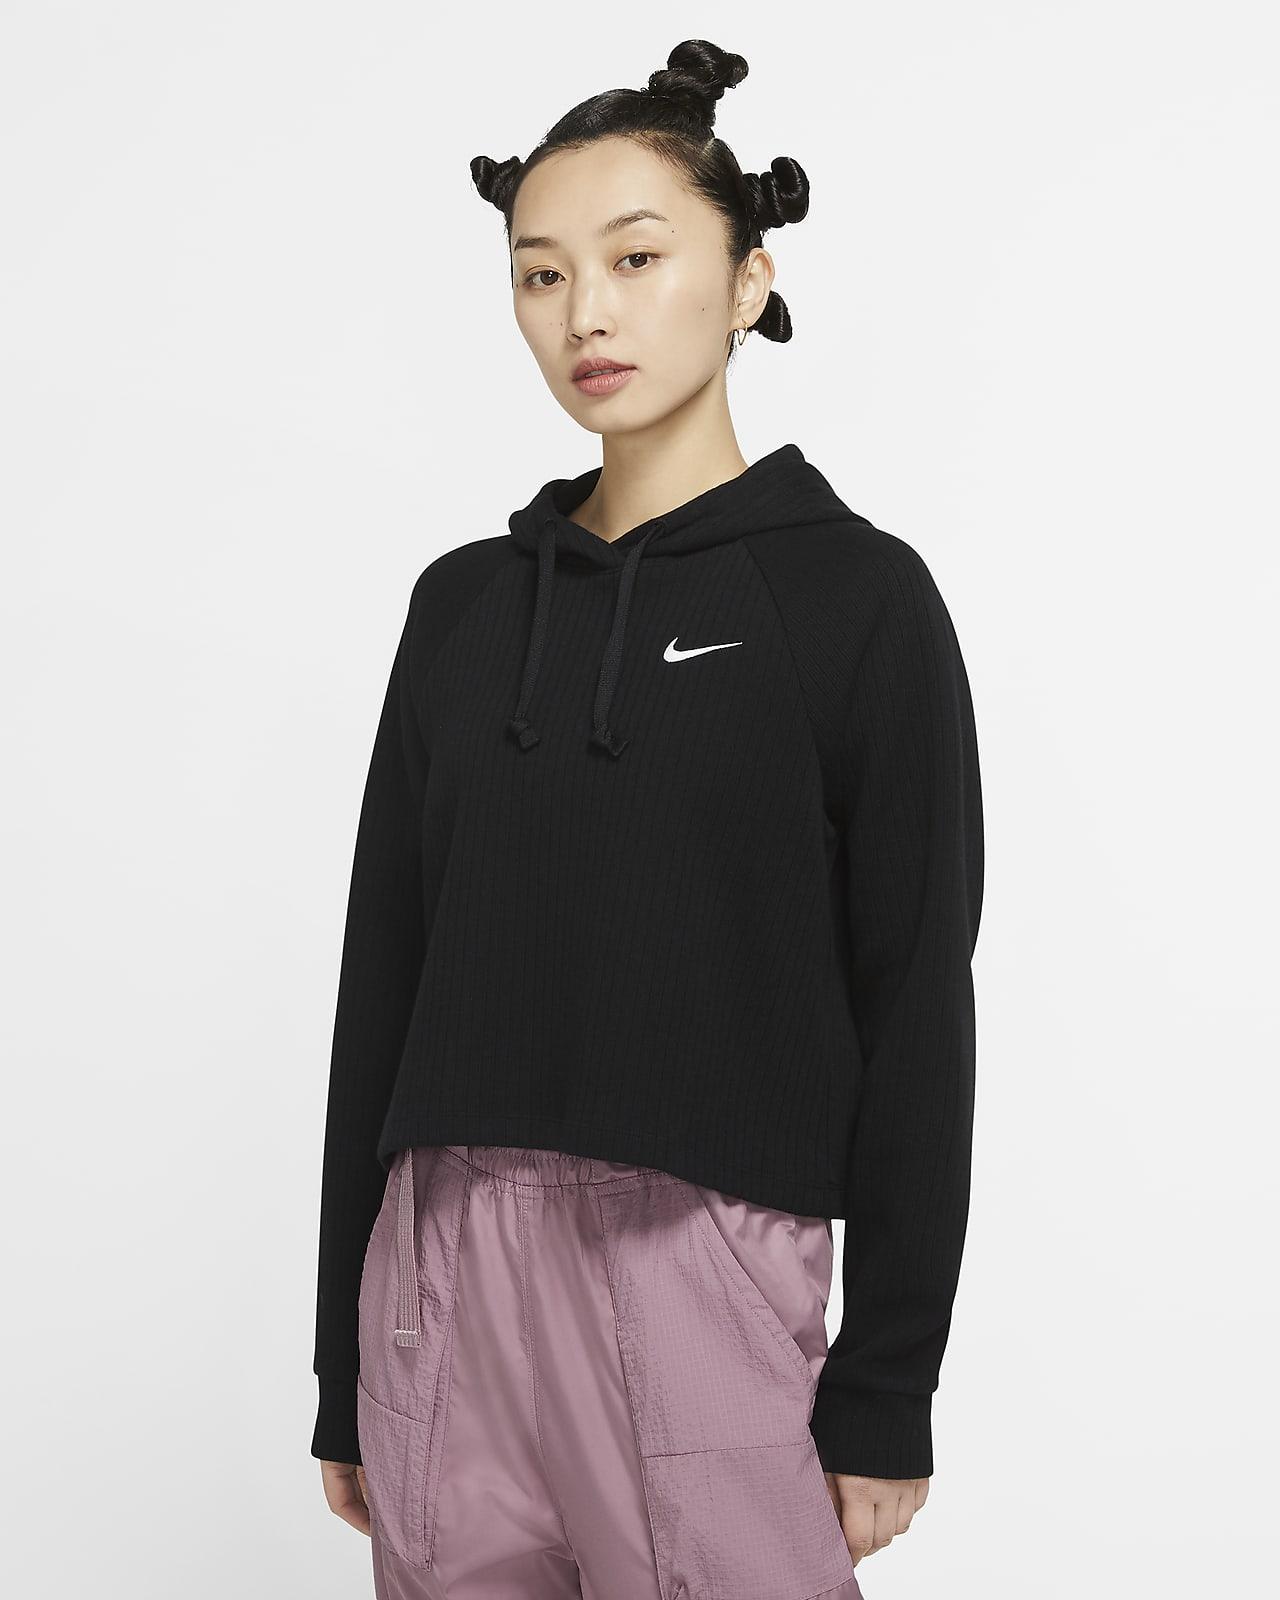 Nike Sportswear 女子连帽衫